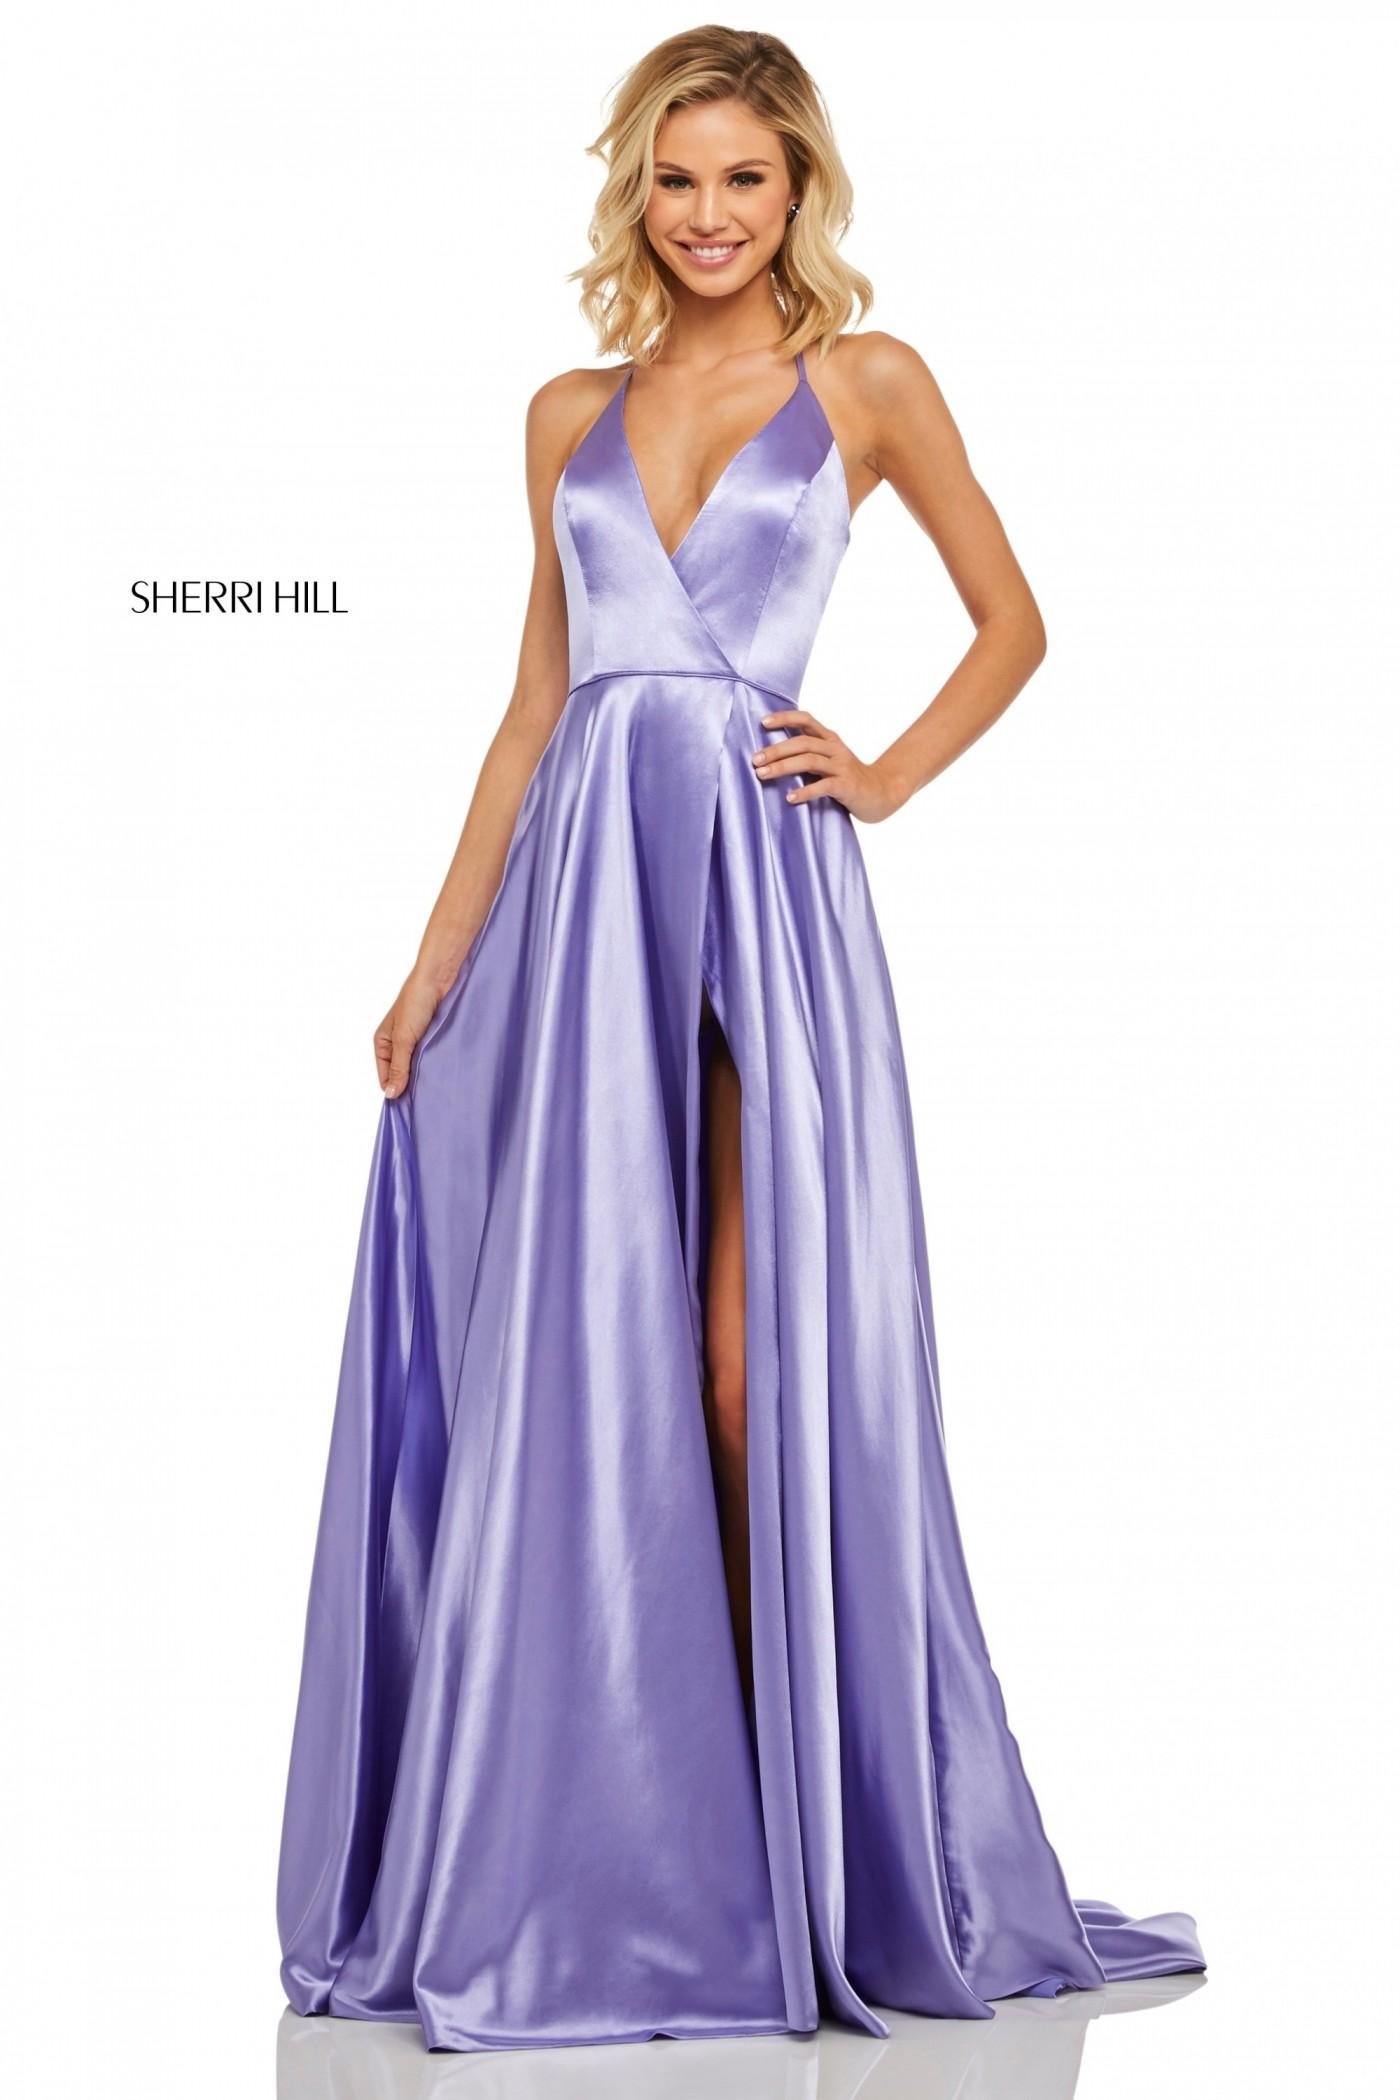 Sherri Hill 52921 Satin V-Neck Halter Top Gown